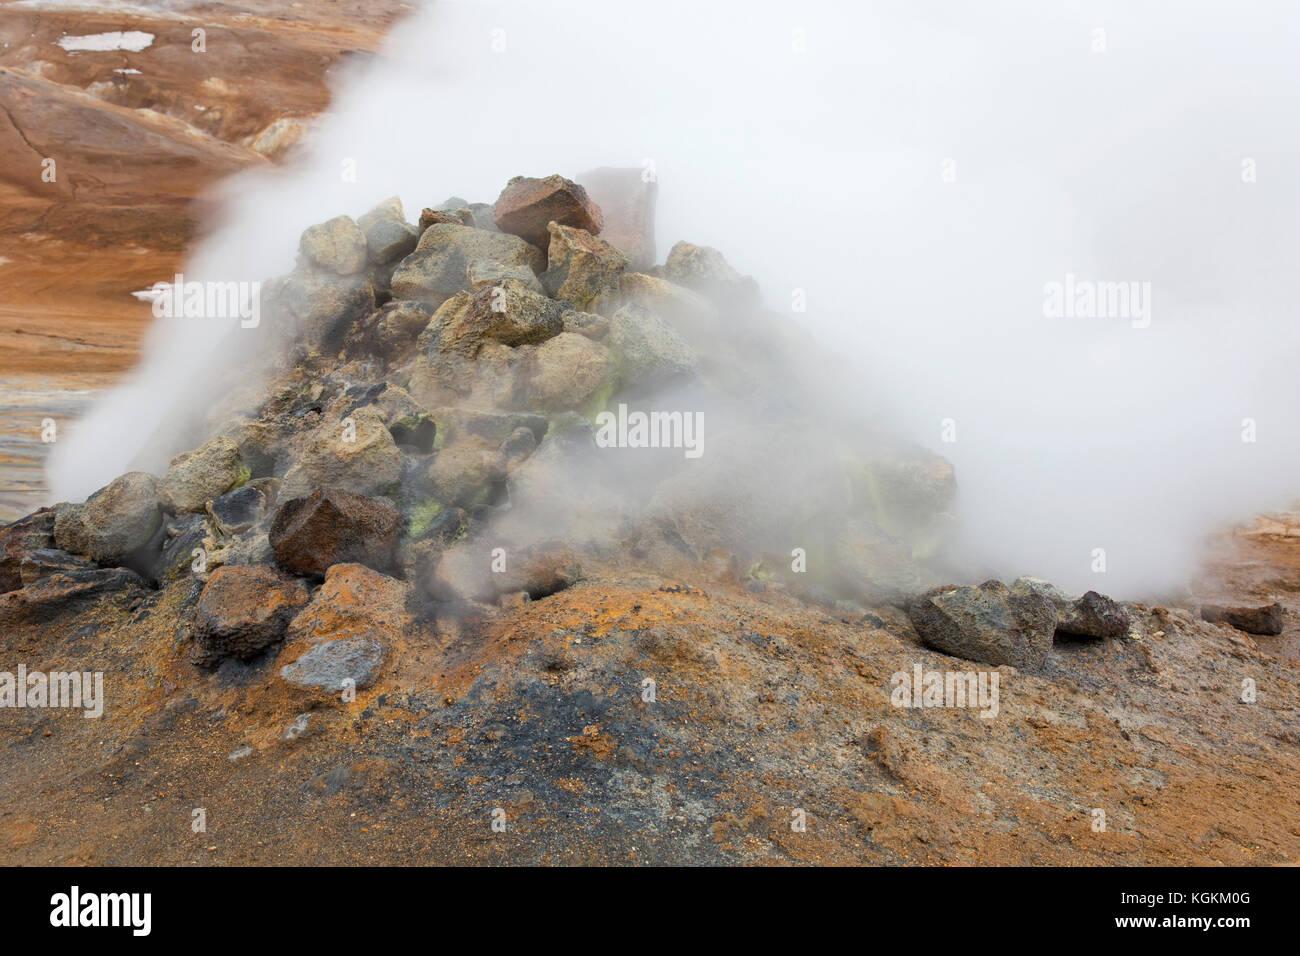 Steaming fumarole at Hverir, geothermal area near Námafjall, Norðurland eystra / Nordurland eystra, Iceland - Stock Image